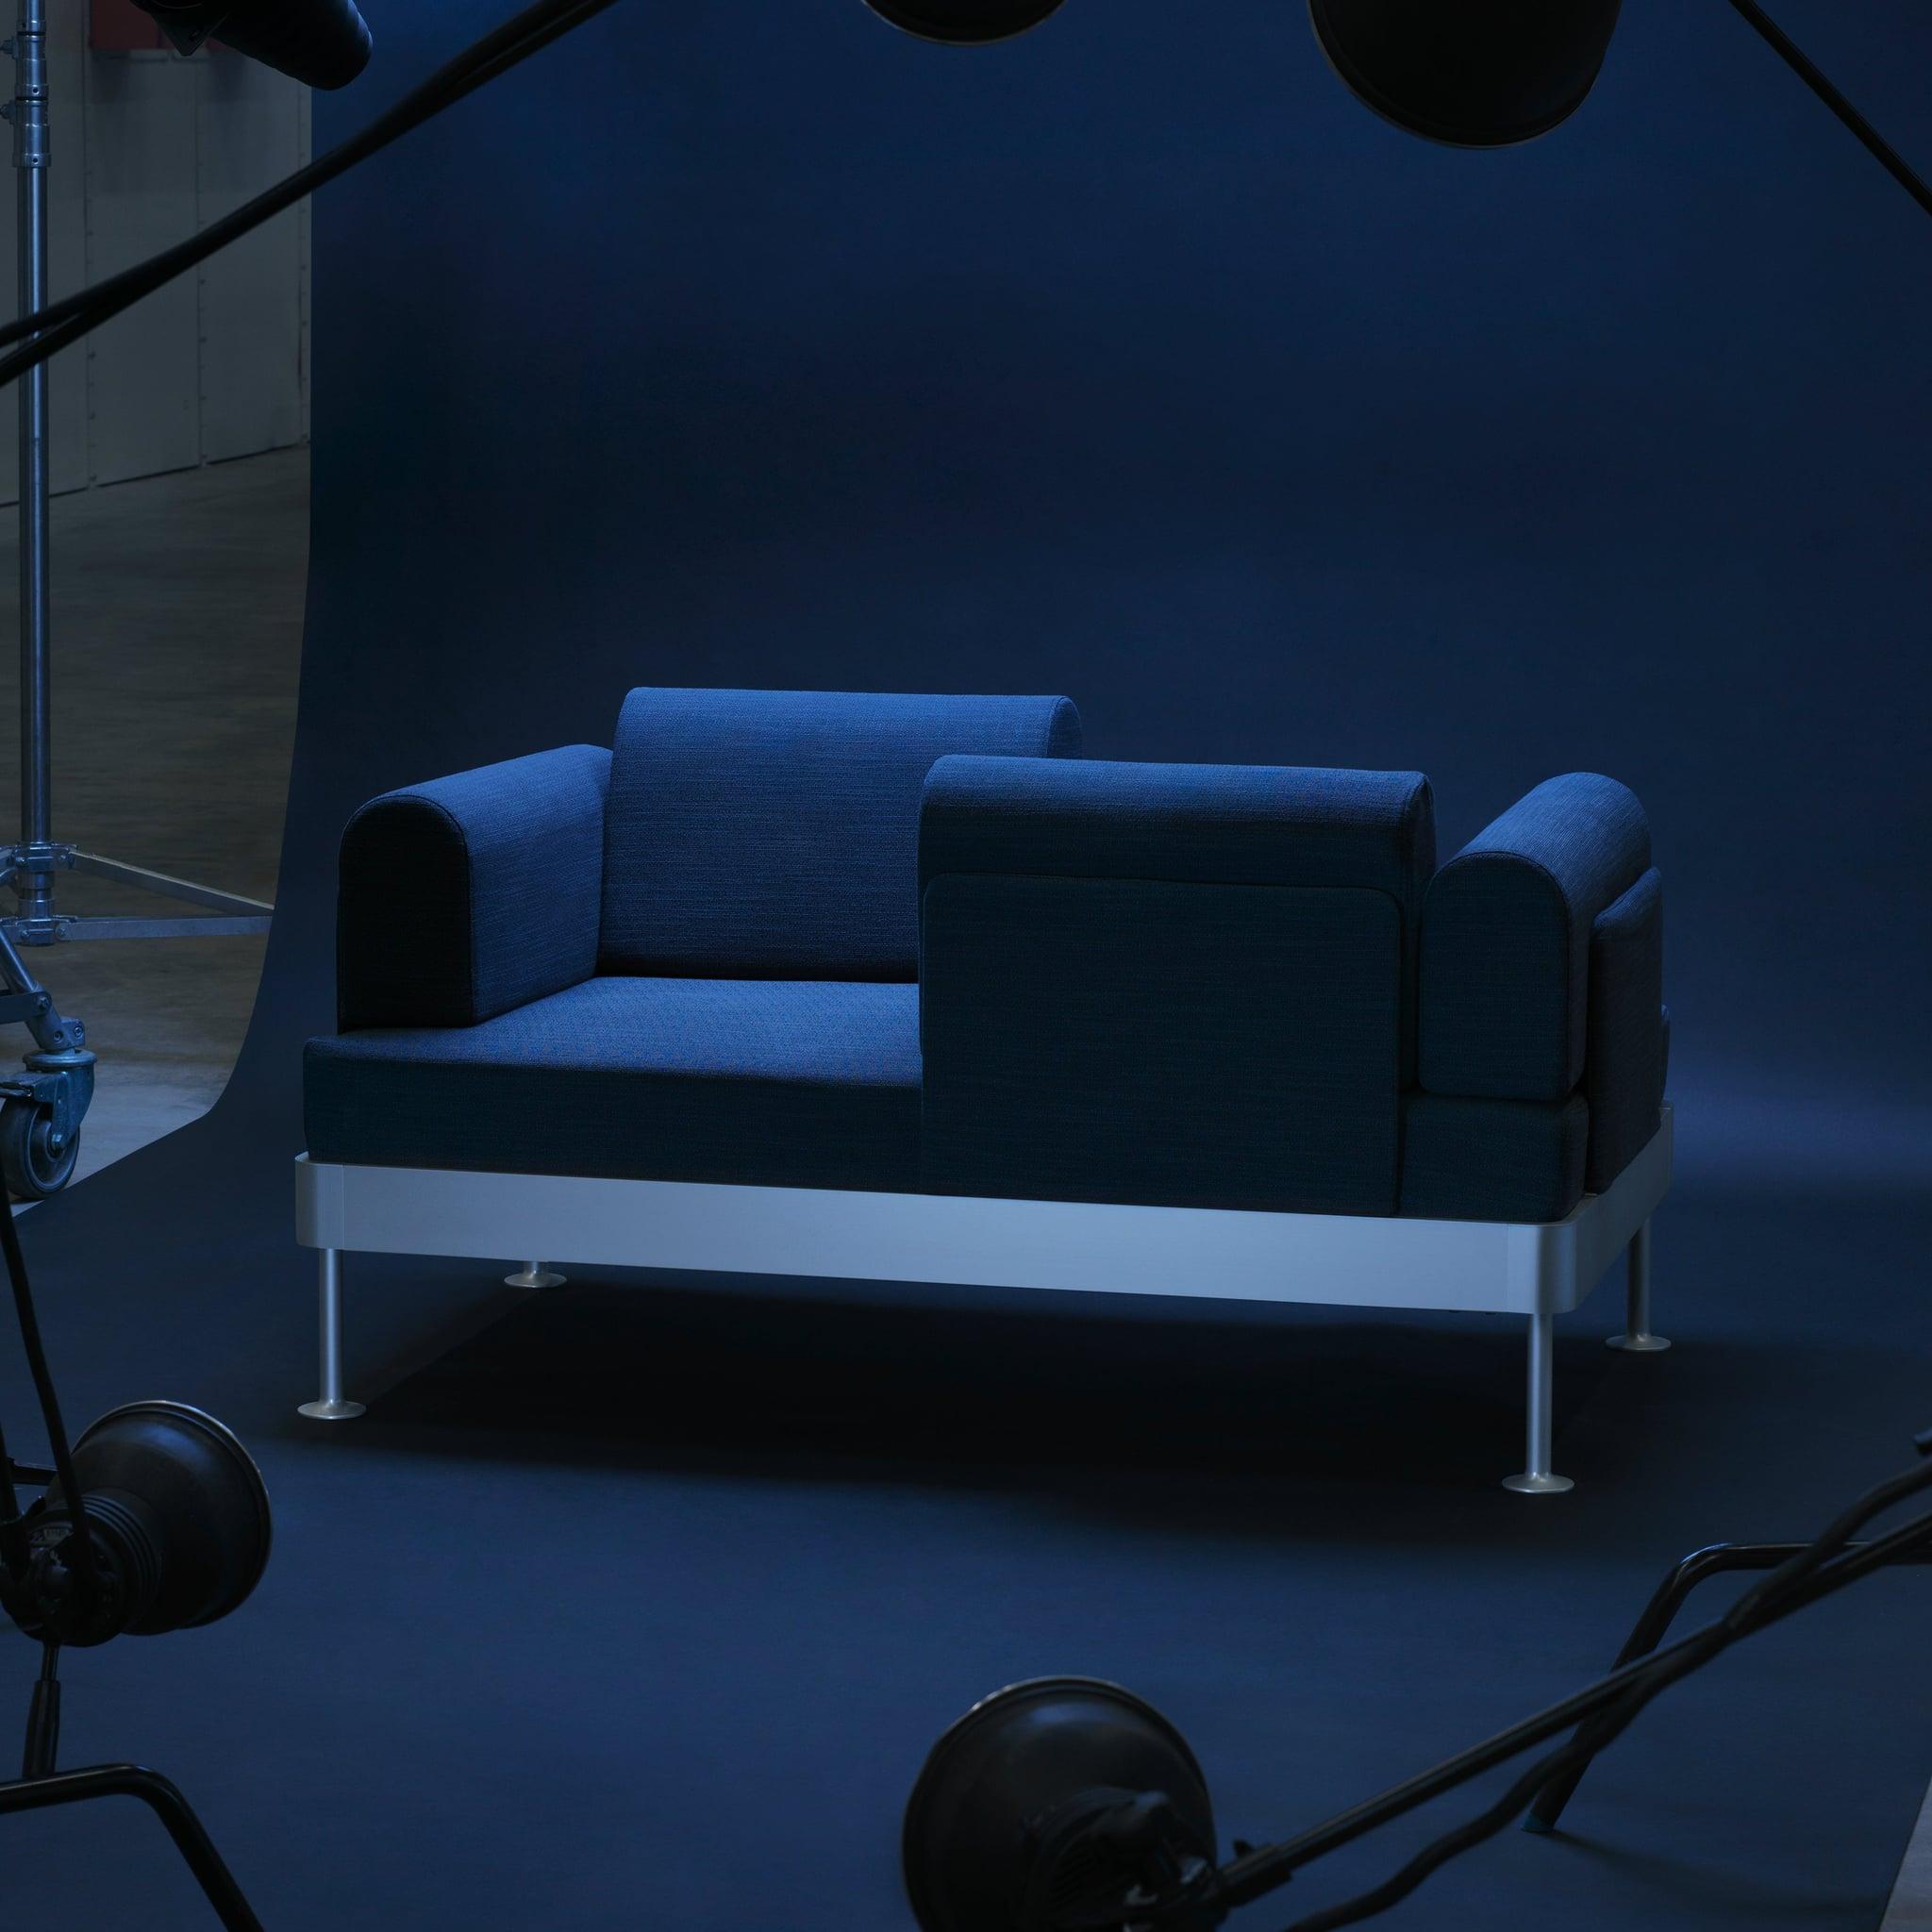 Tom dixon interview ikea collaboration bed sofa in australia tom dixon interview ikea collaboration bed sofa in australia popsugar home australia parisarafo Choice Image